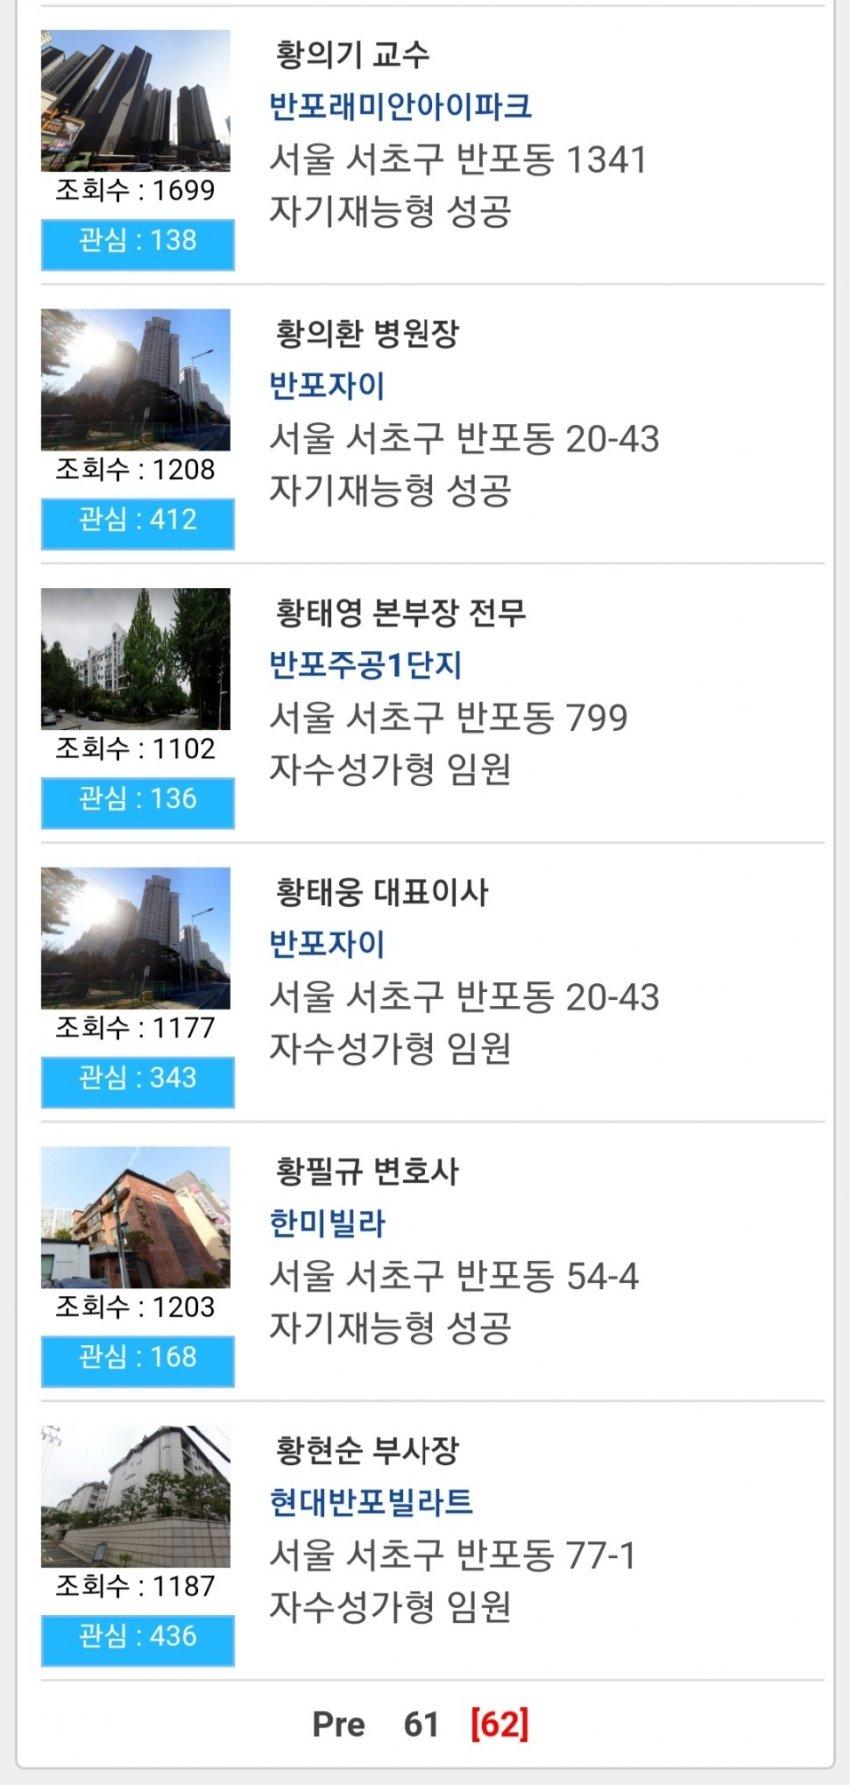 viewimage.php?id=24b0dd29f3d33aaa6bac&no=24b0d769e1d32ca73ceb86fa11d02831eebc6c37c2fa034916facb03232605e3d60f2b4282eddd968e6ae2c8400549b3ae5f5a8a0e813a723021d8db771aeebfb4b9ebc929417be1eaa8d0f404d65c35c08c180099bb1b7af1727b8fb6989e3bf23a3110aa433a08bfb4ca3018e1be4d